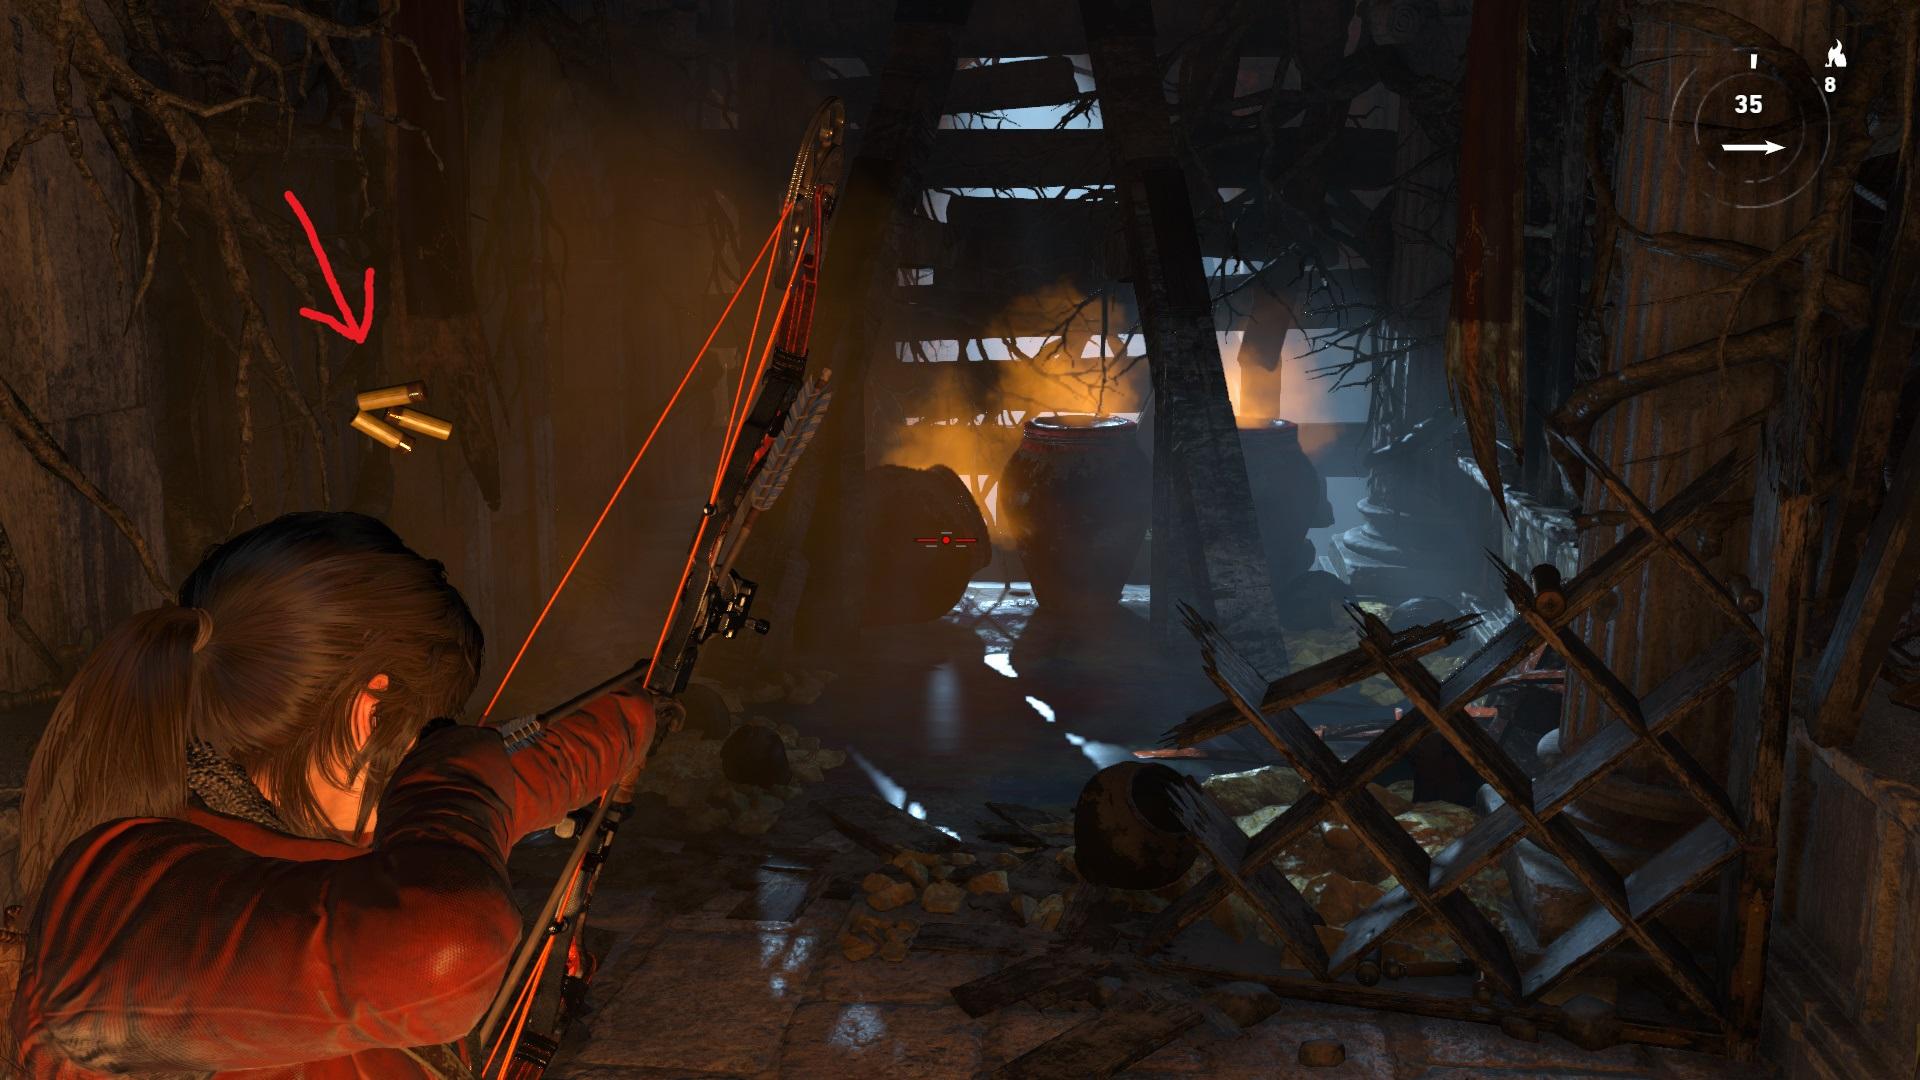 баг с патронами - Rise of the Tomb Raider